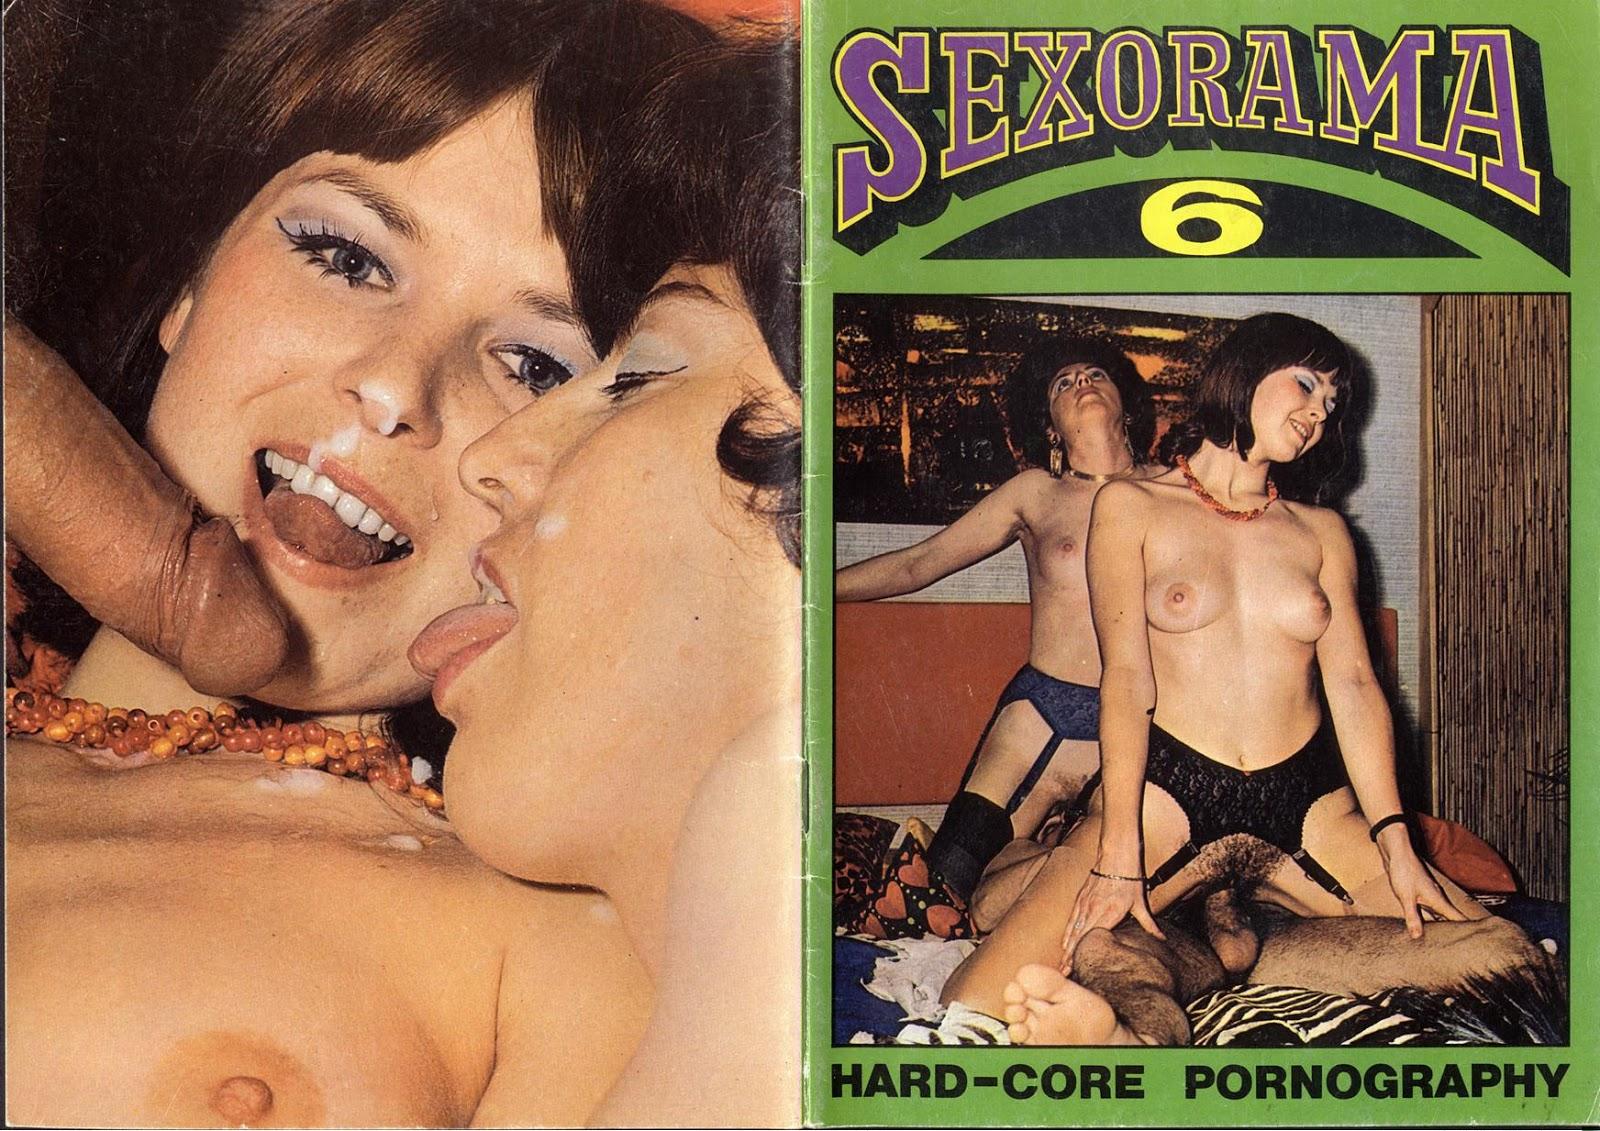 Vintage crossdressers xxx - Vintage crossdresser porn vintage crossdresser  sex vintage crossdresser rodox porn stockings hairy